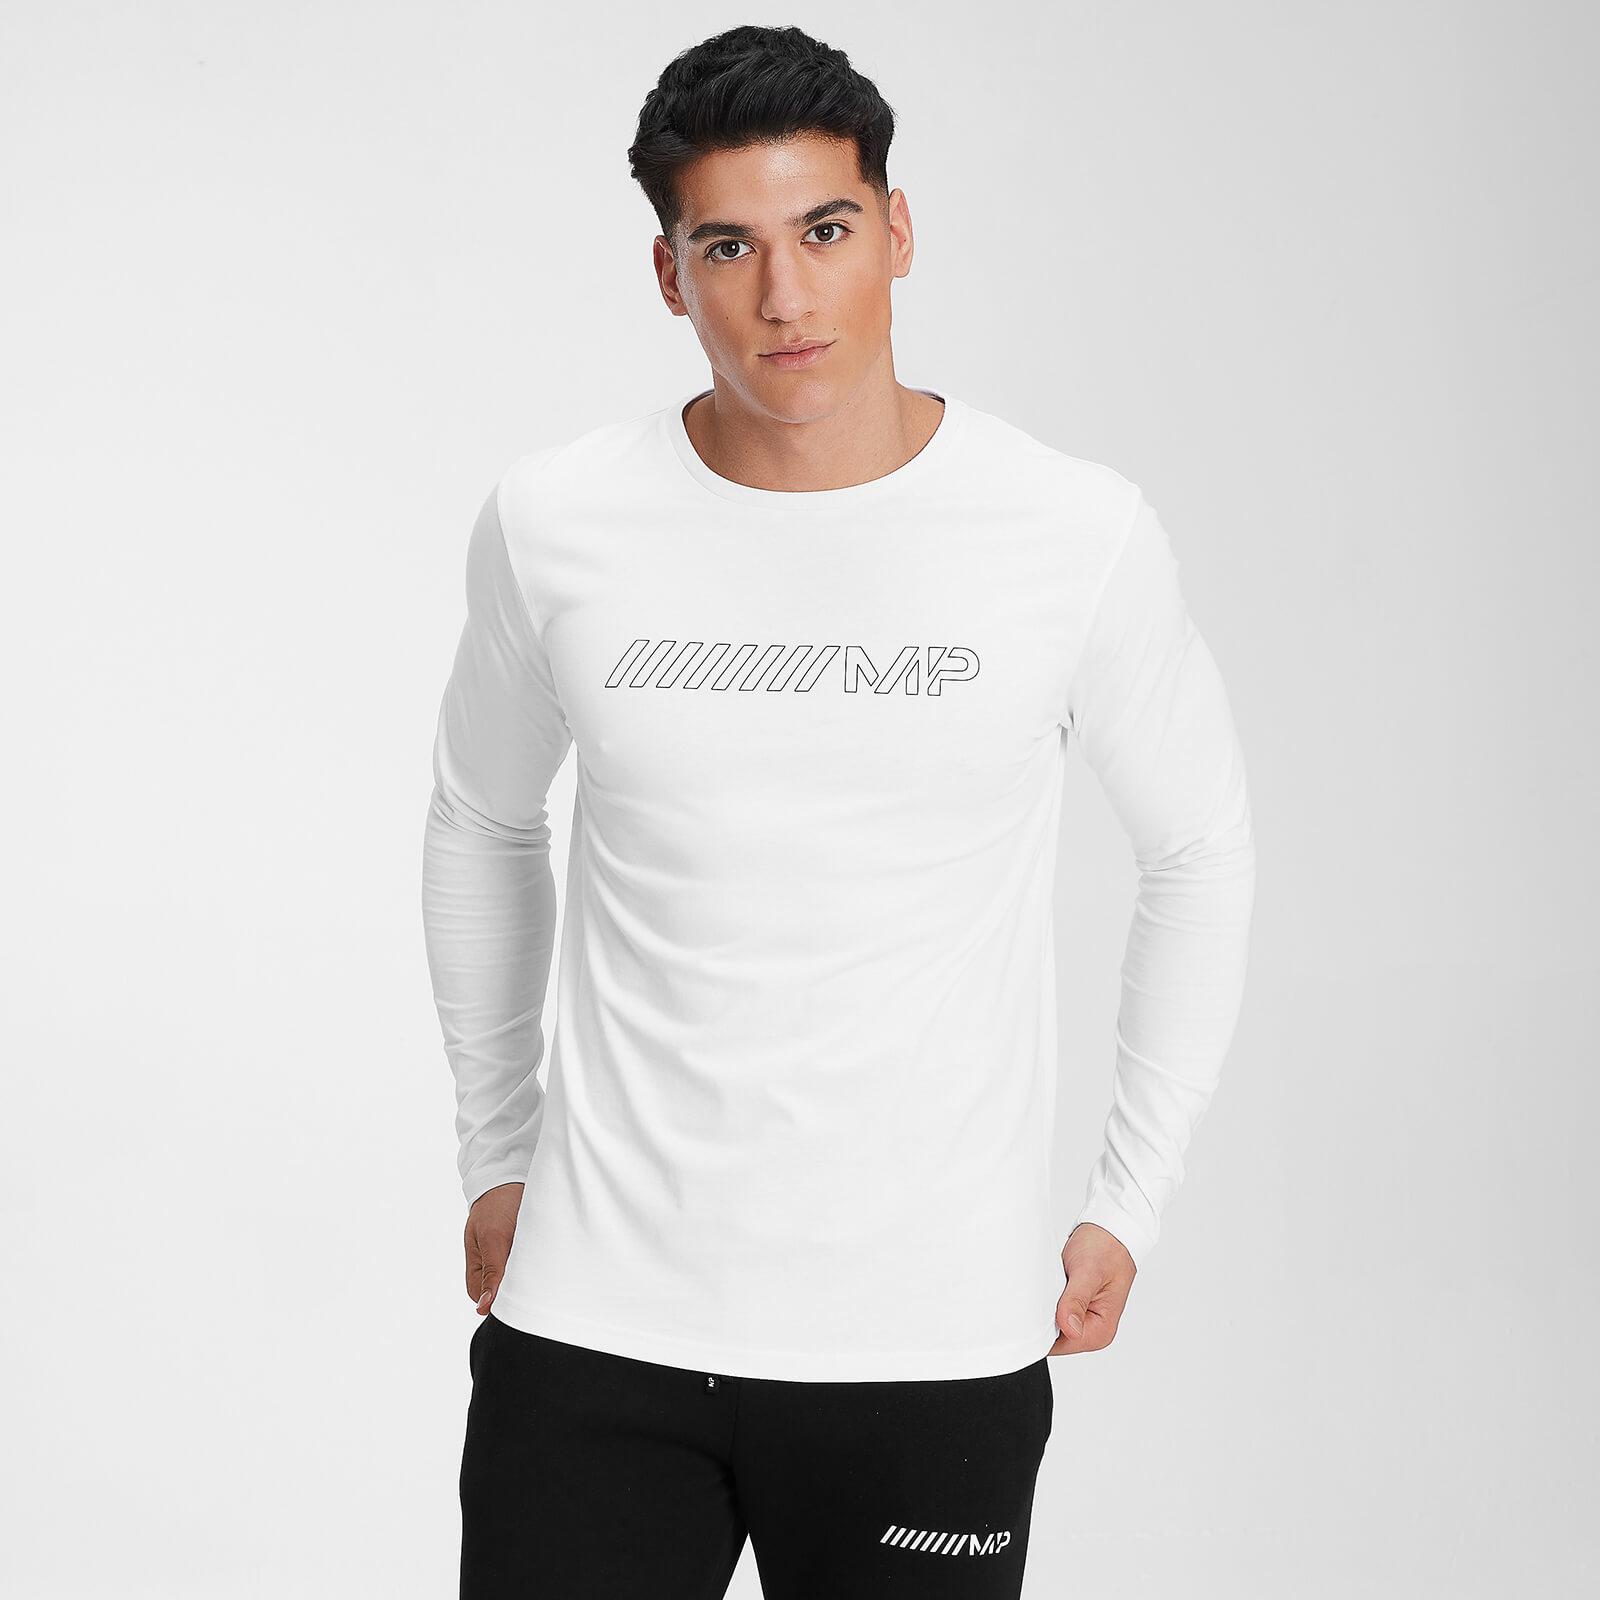 Купить MP Men's Outline Graphic Long Sleeve Top - White - XXS, Myprotein International